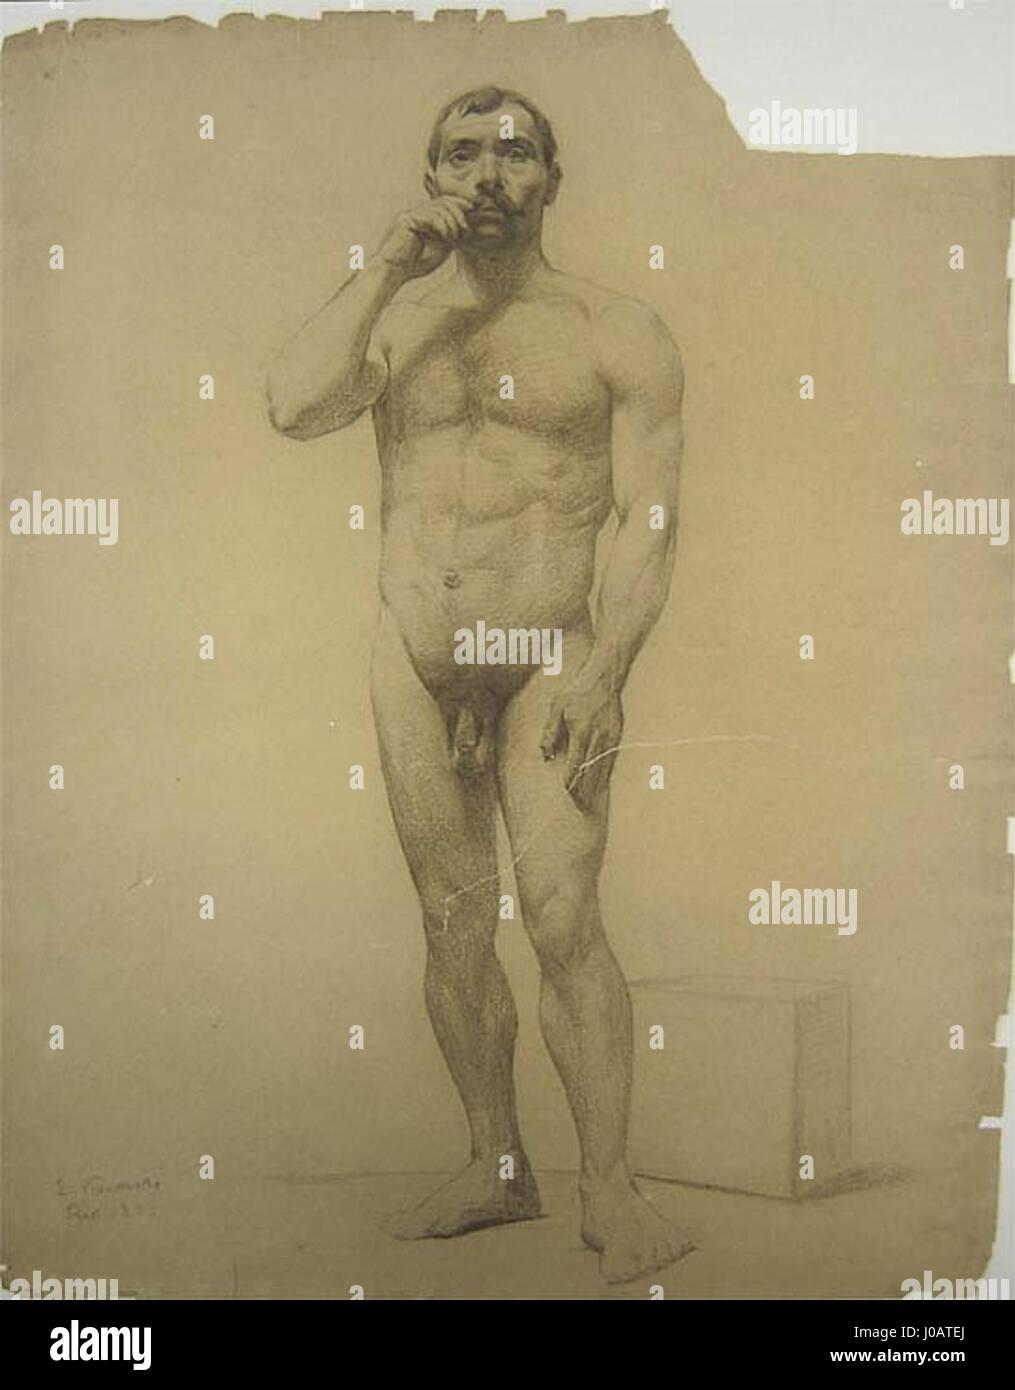 Eliseu Visconti - Nu masculino de pé 1889 Imagen De Stock